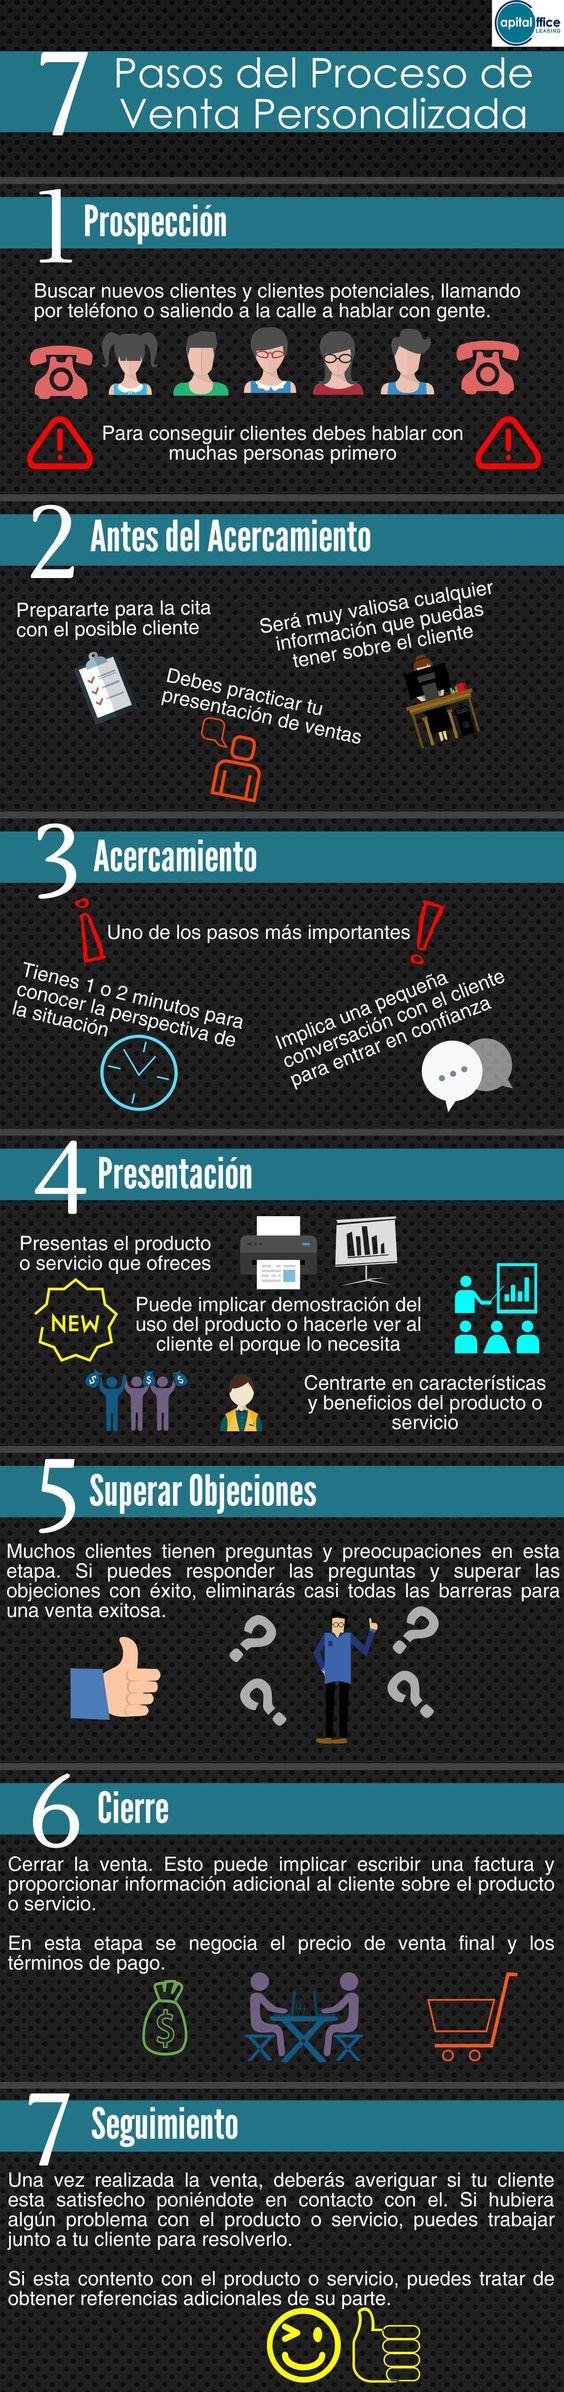 7 pasos del proceso de venta directa #capitaloffice #impresion #gestiondocumental